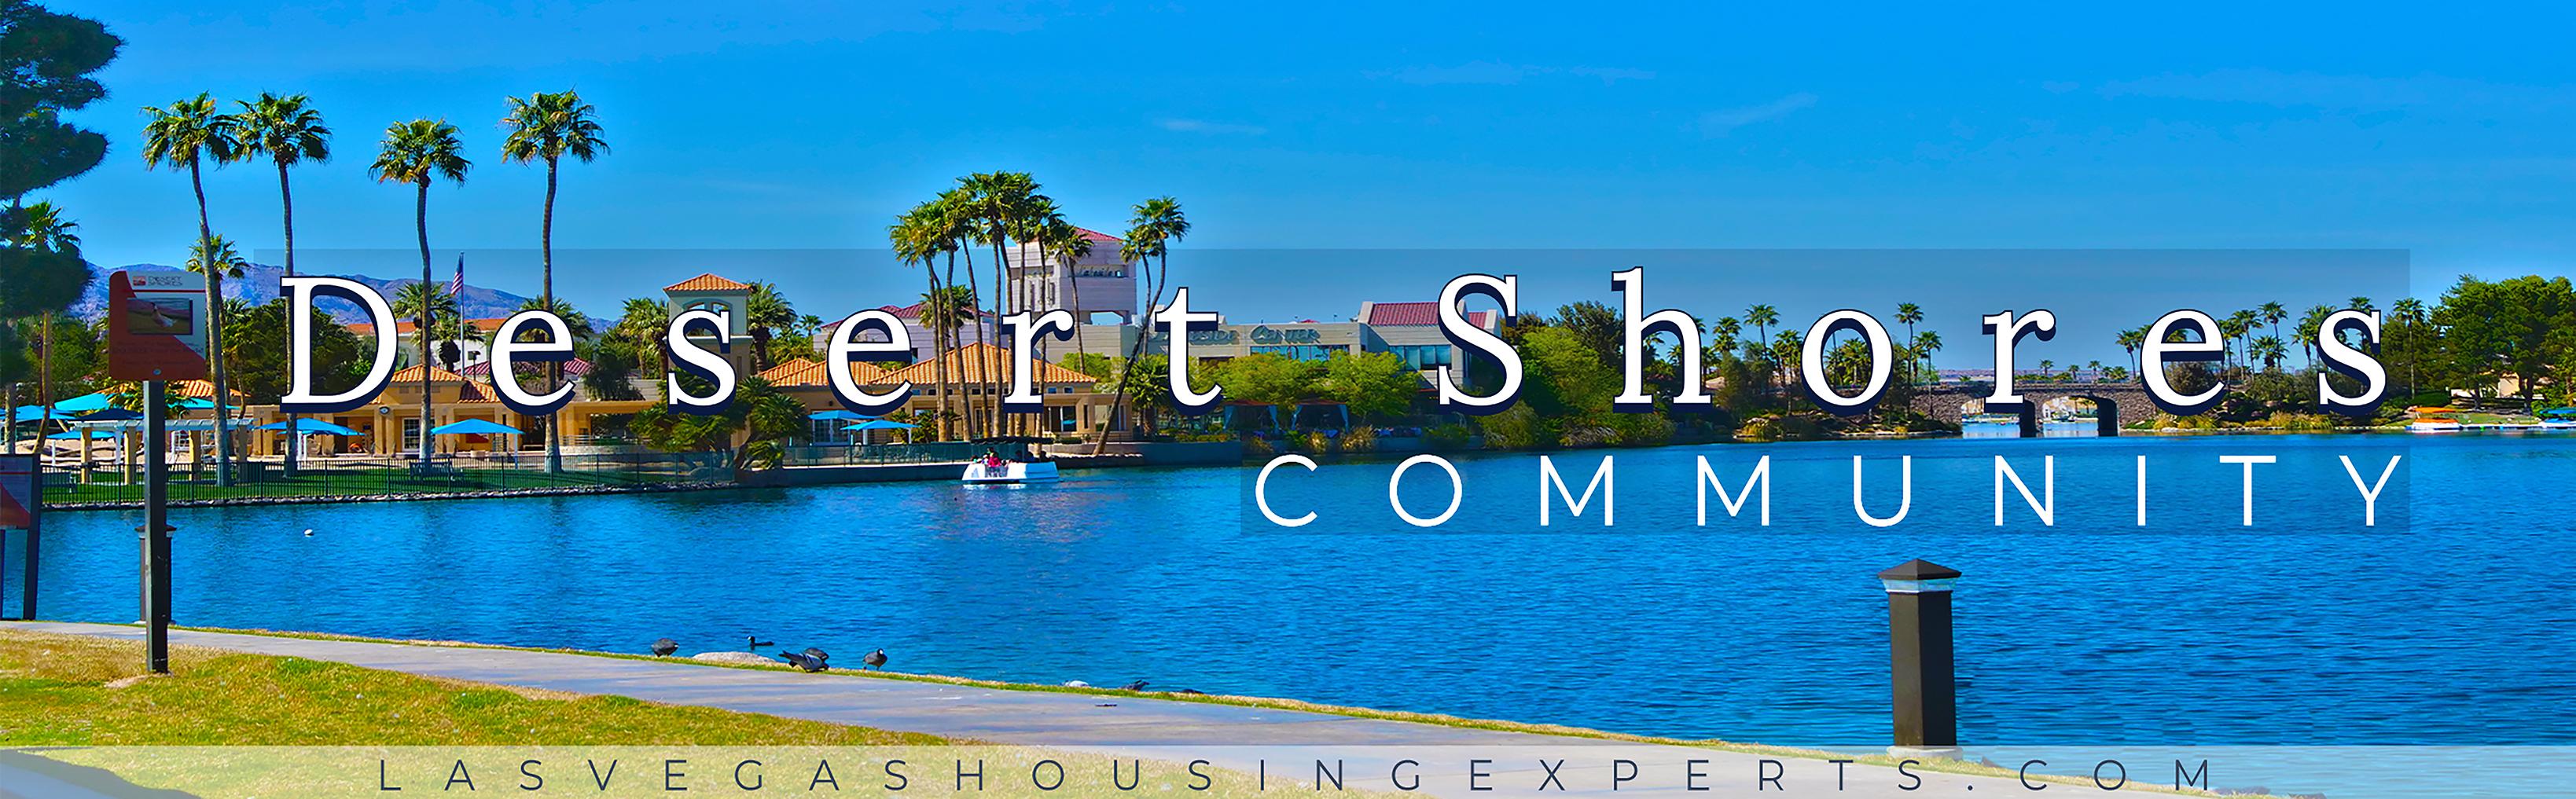 Desert Shores Las Vegas Housing Experts real estate